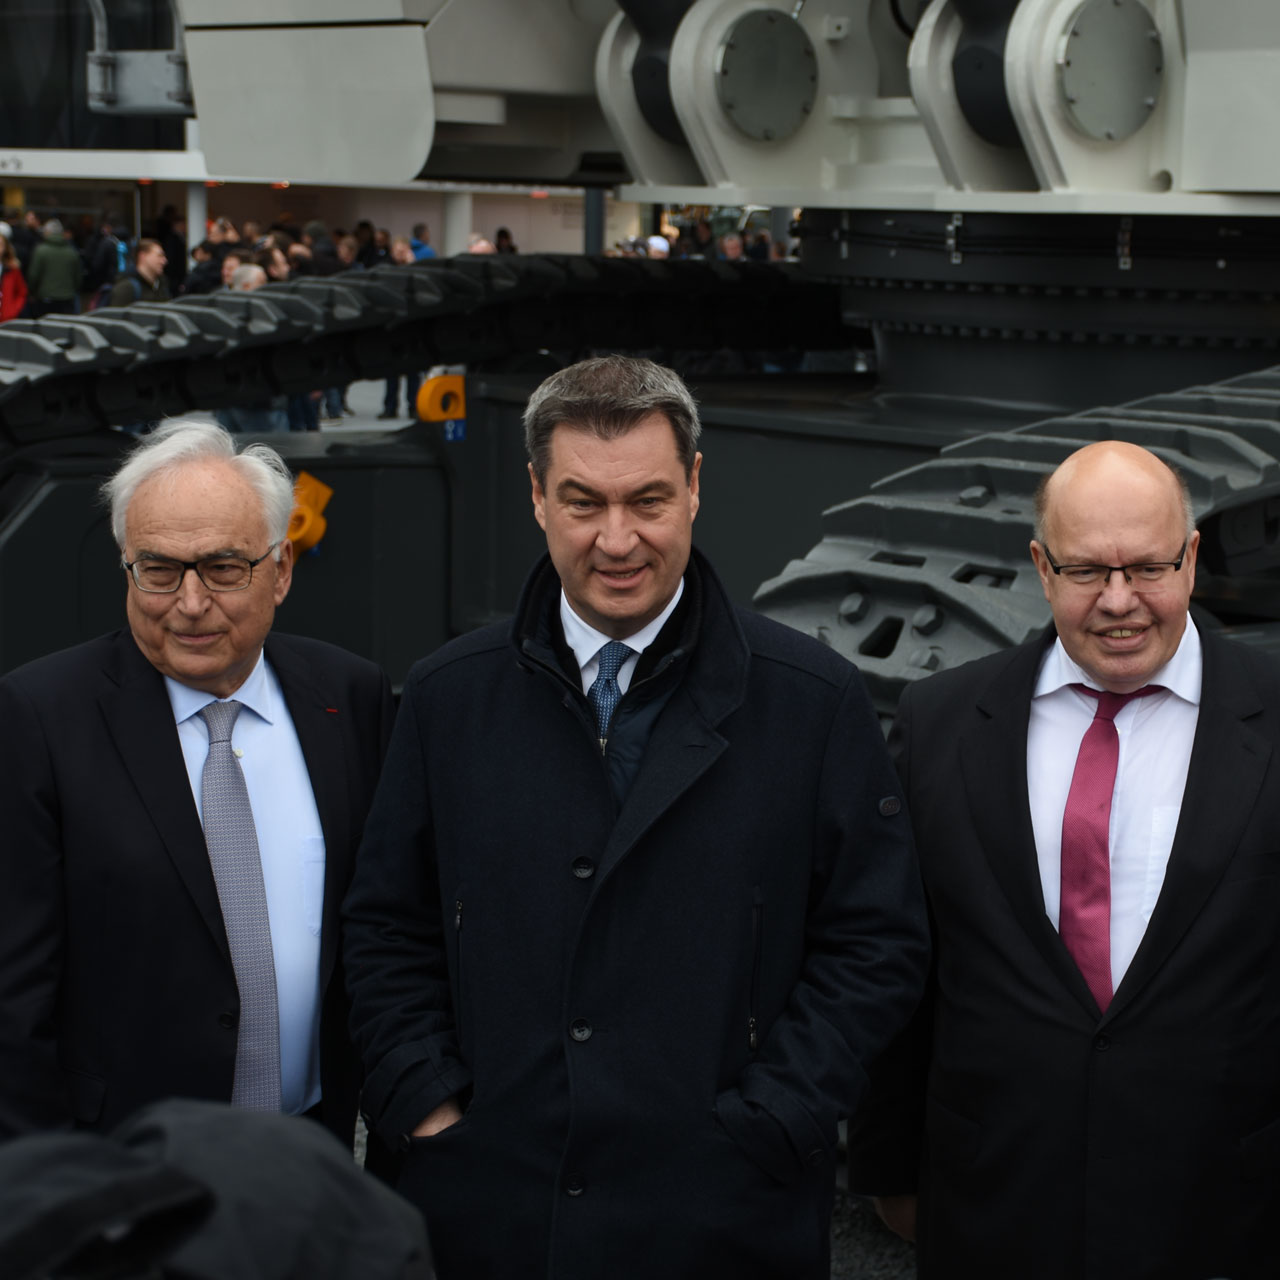 bauma 2019 Eröffnung: Willi Liebherr, Markus Söder, Peter Altmaier